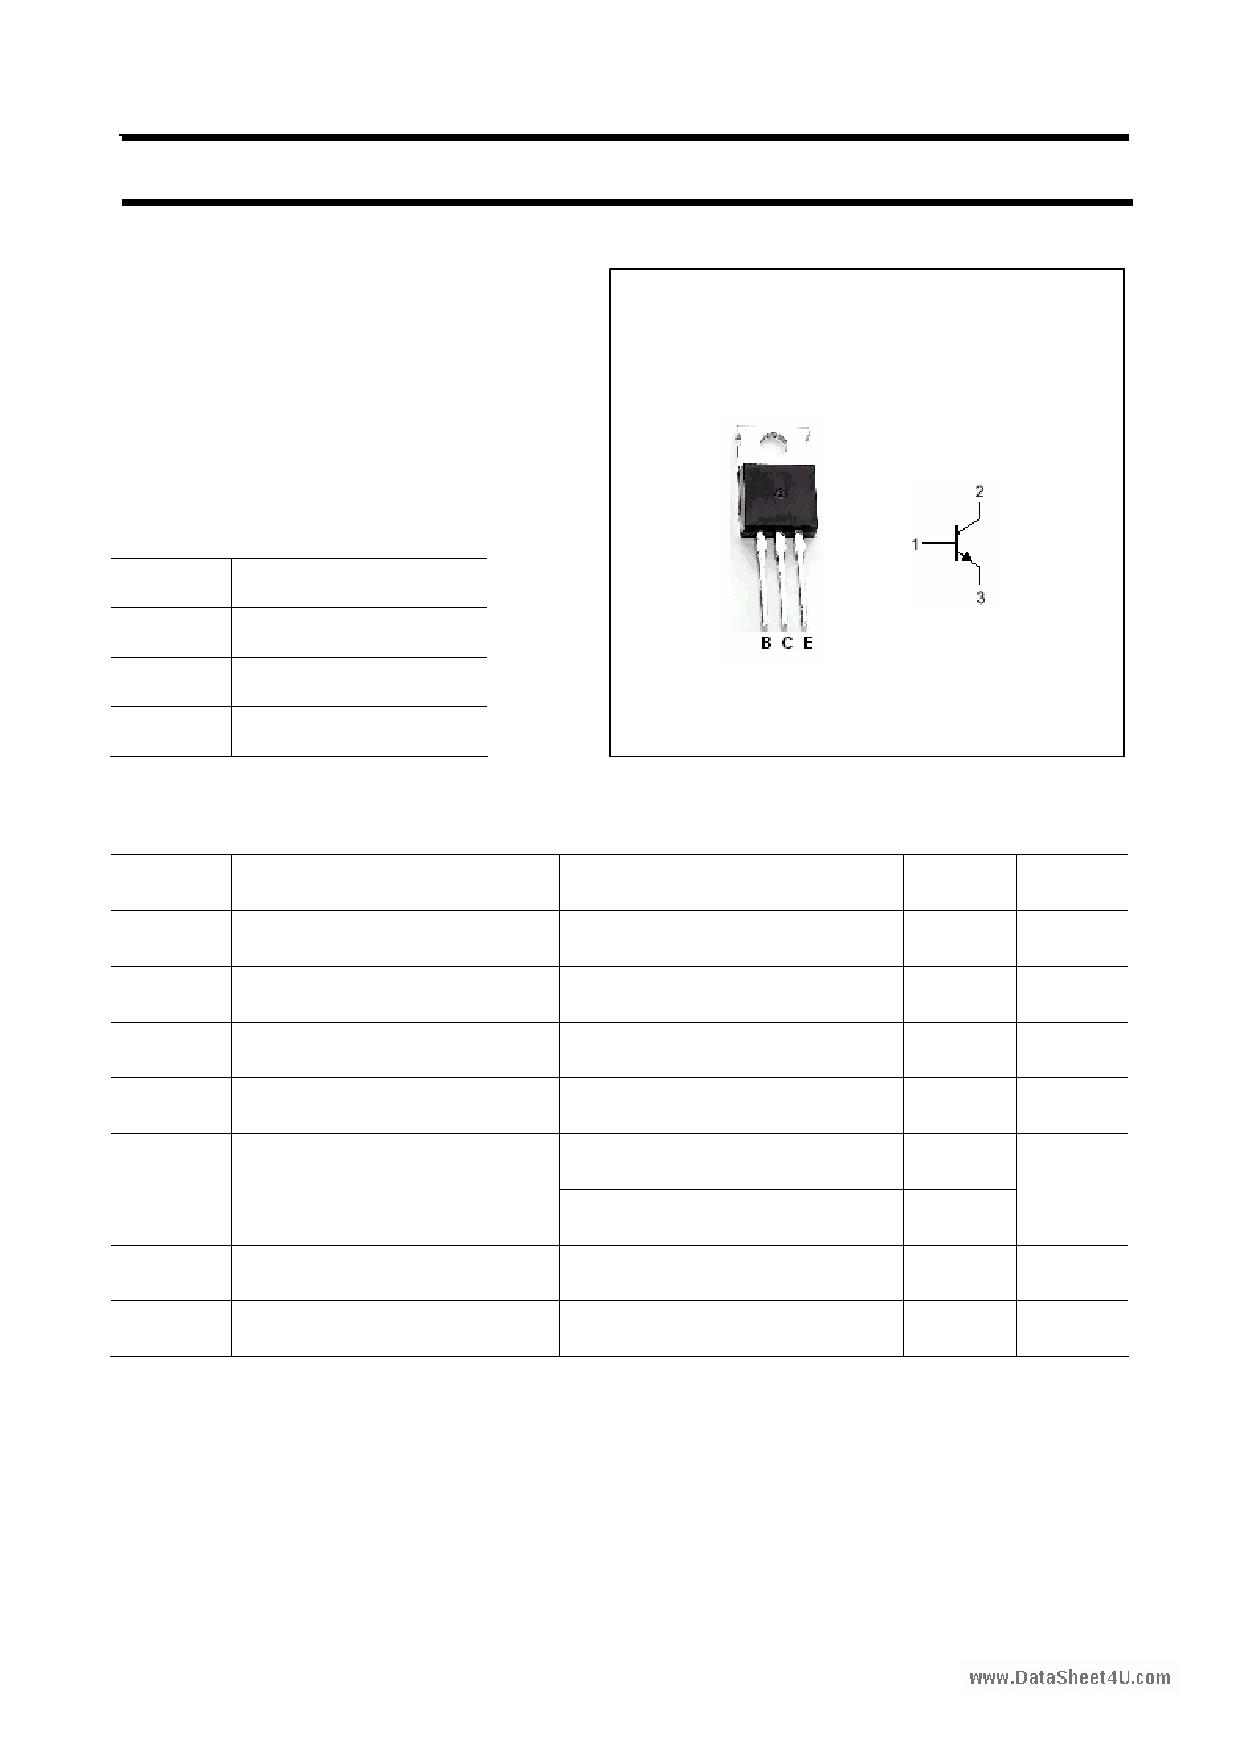 C1569 Datenblatt PDF